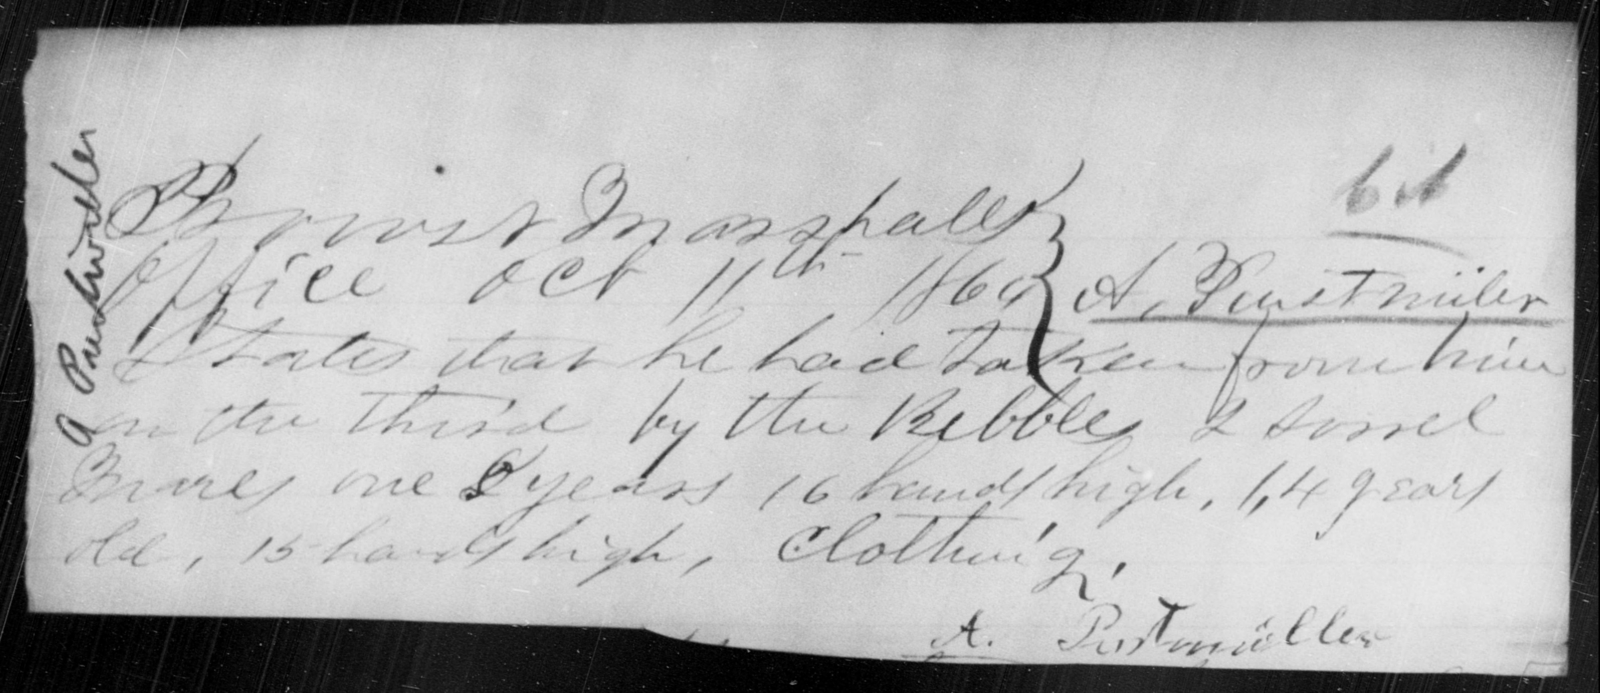 Purstweller, A - State: [Blank] - Year: 1864